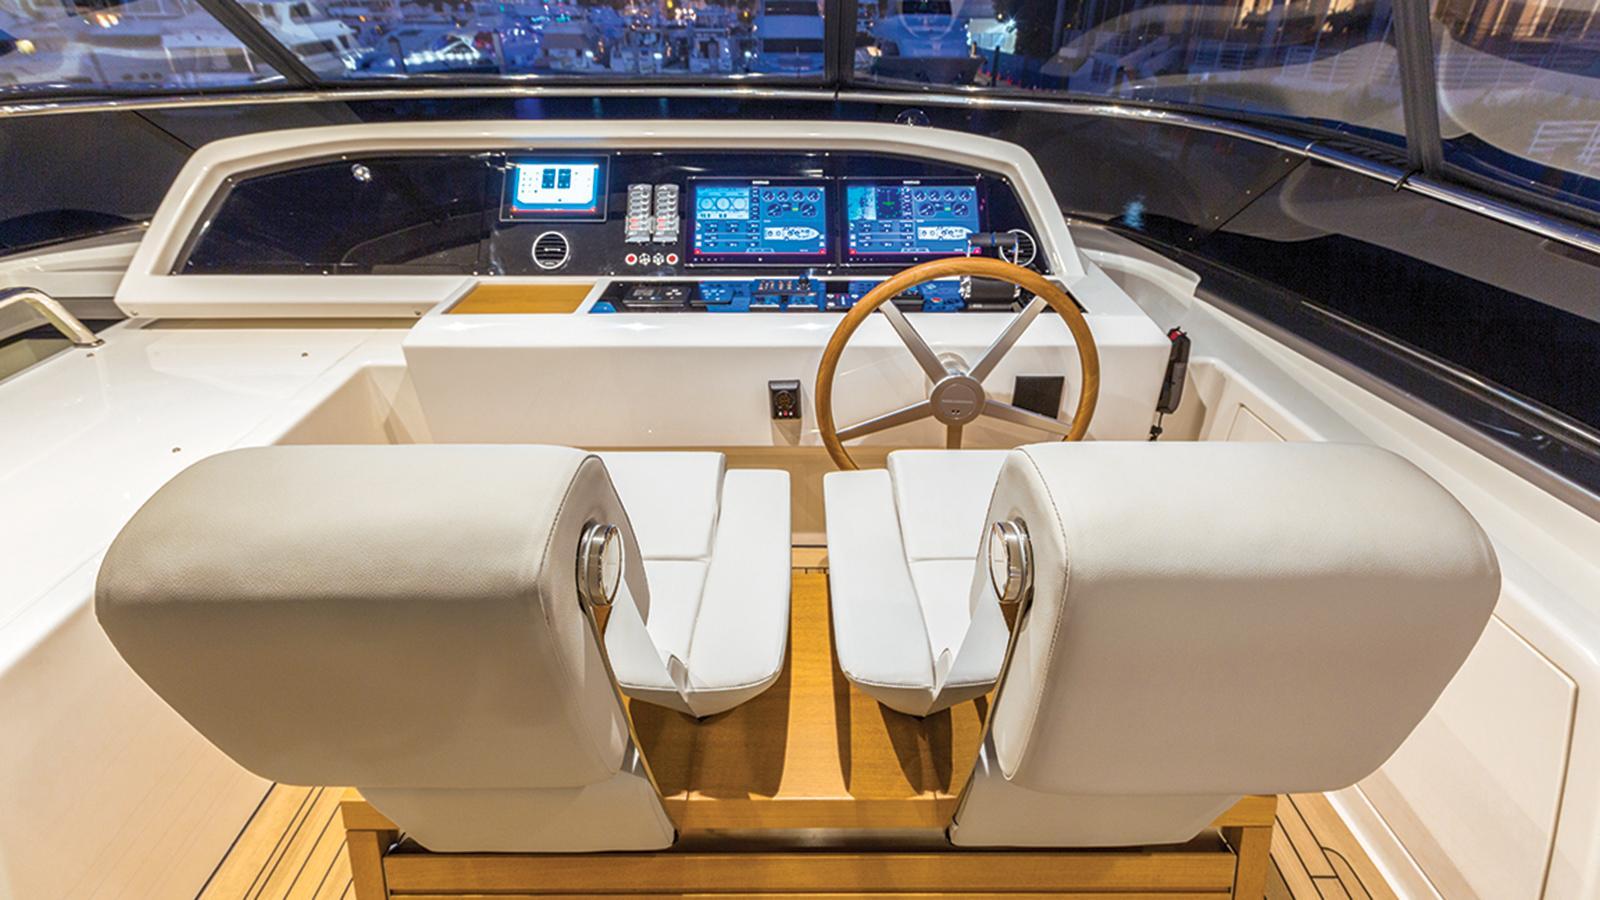 hull 651 motoryacht sanlorenzo sl86 27m 2016 sundeck wheel station credit jim raycroft